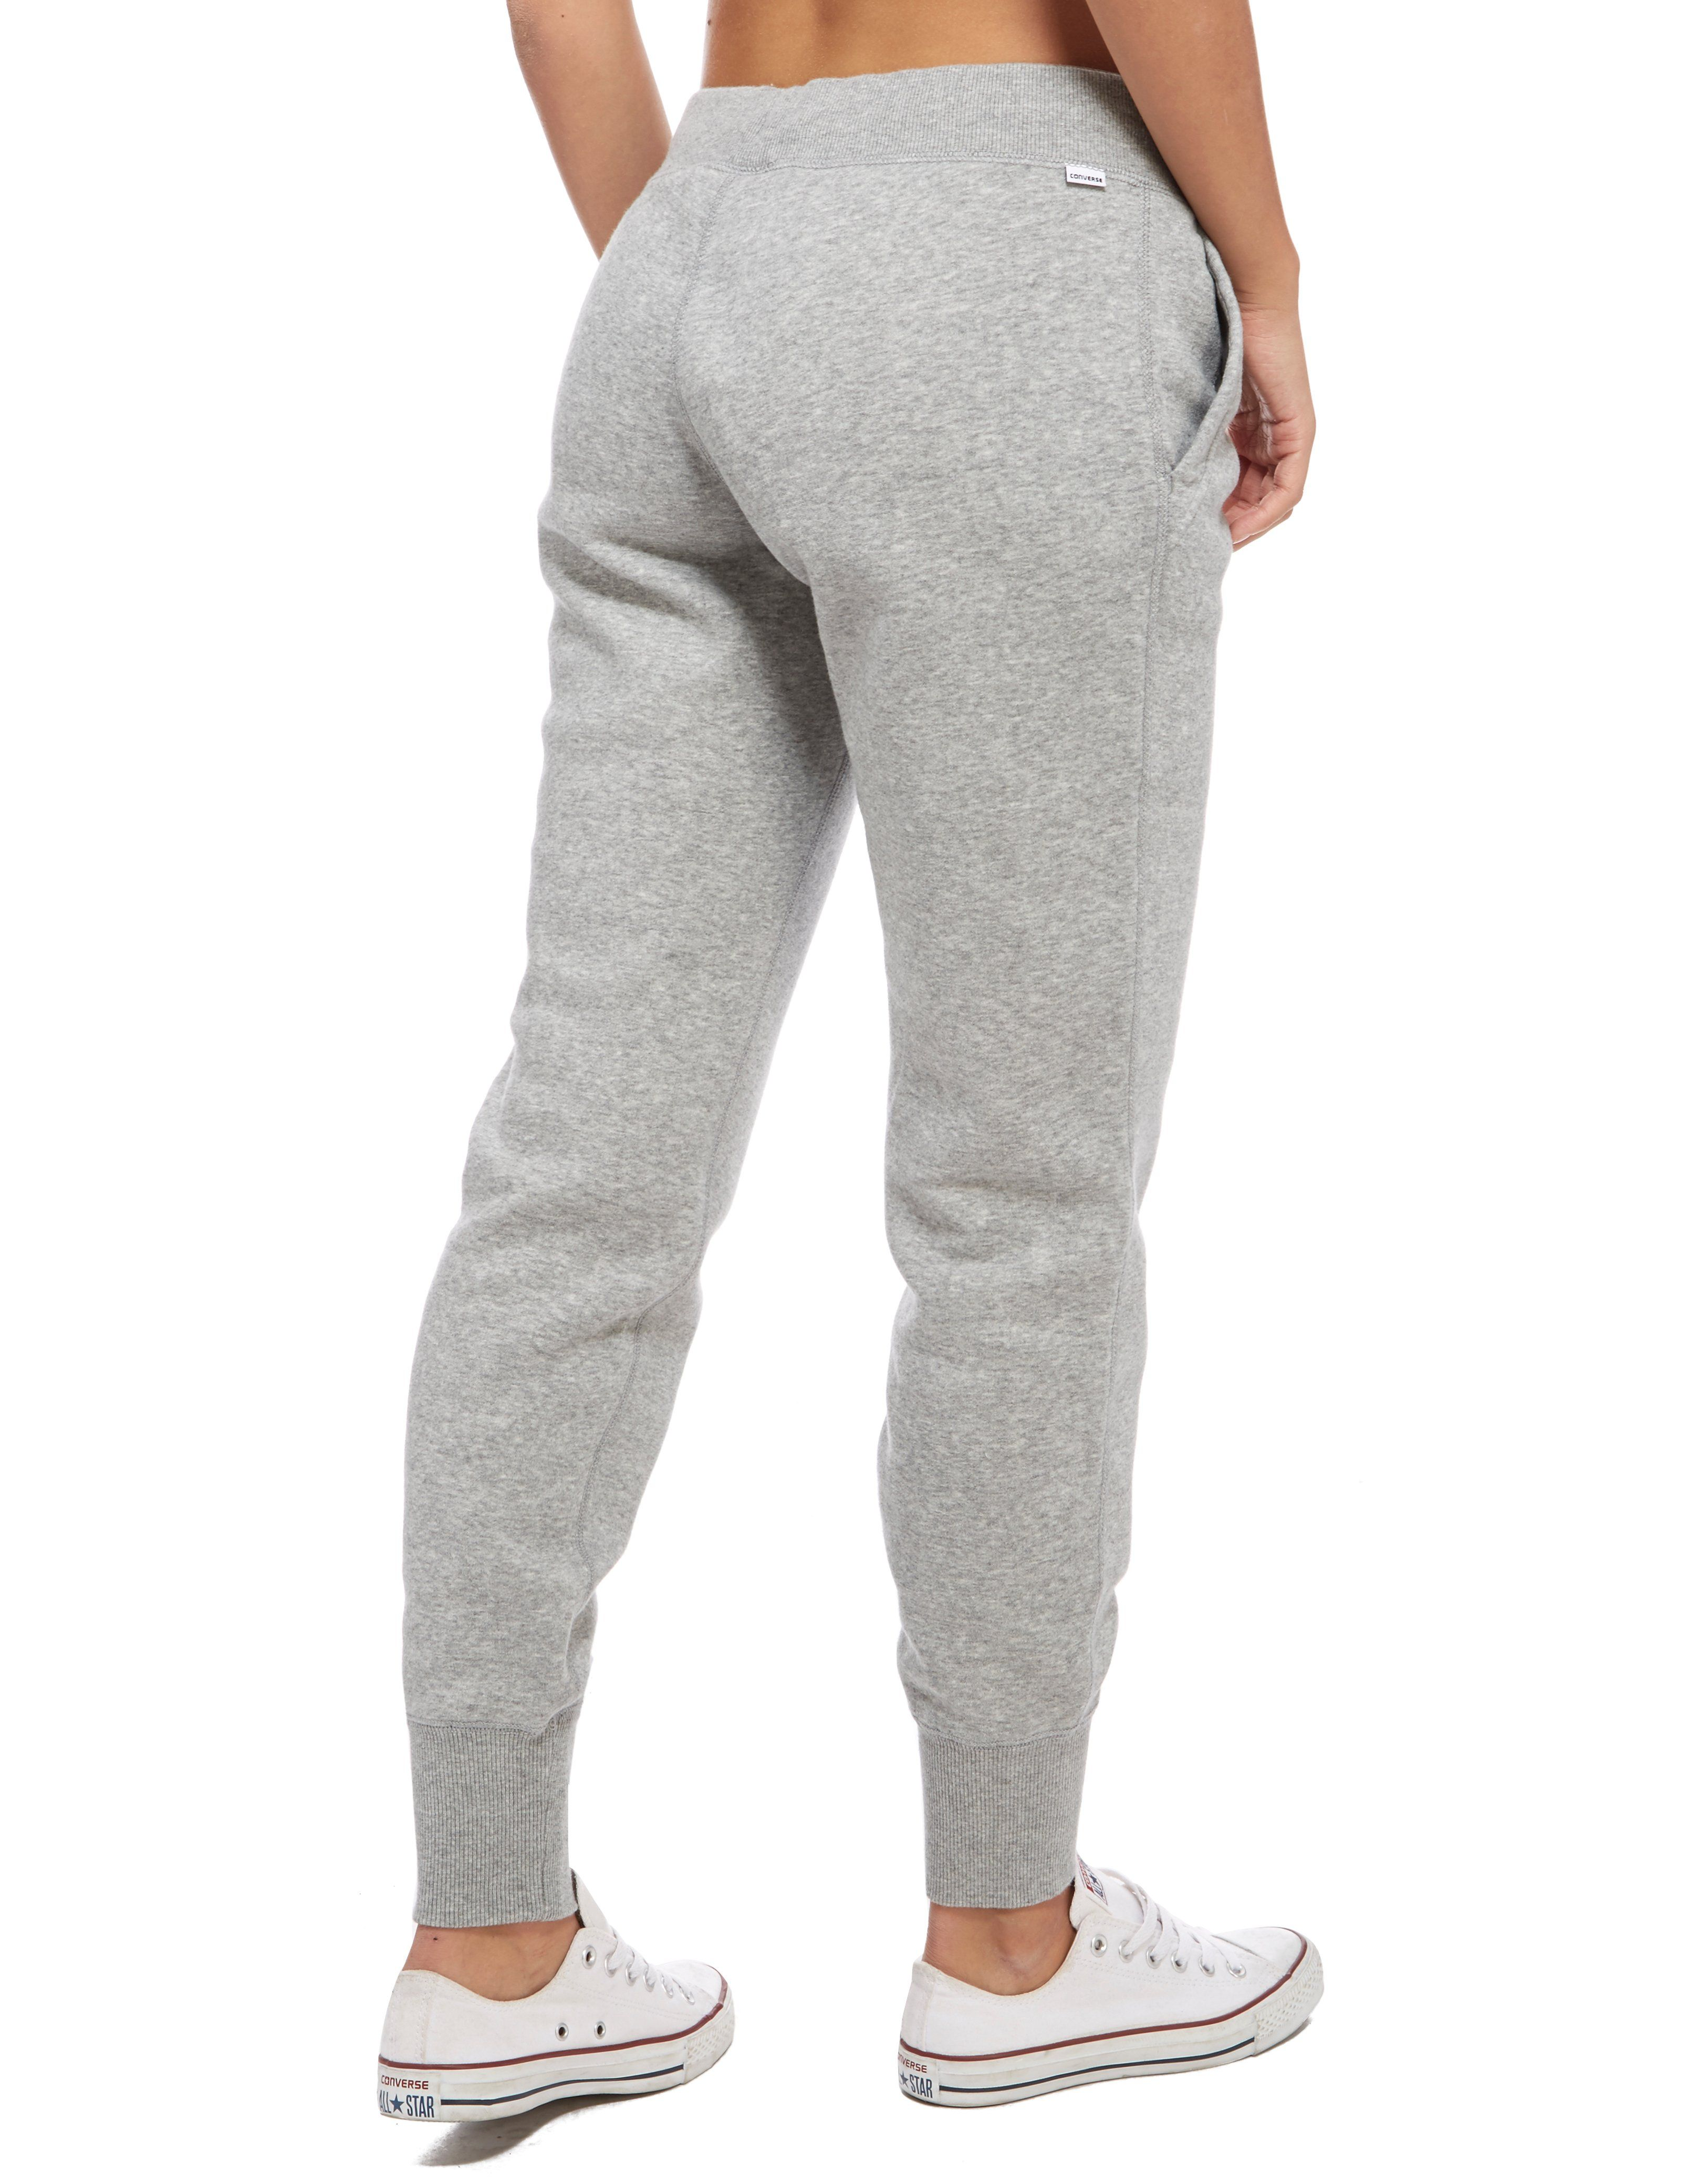 Grau Converse Grau Fleece Pants Chuck Pants Fleece Chuck Converse wqP8waB